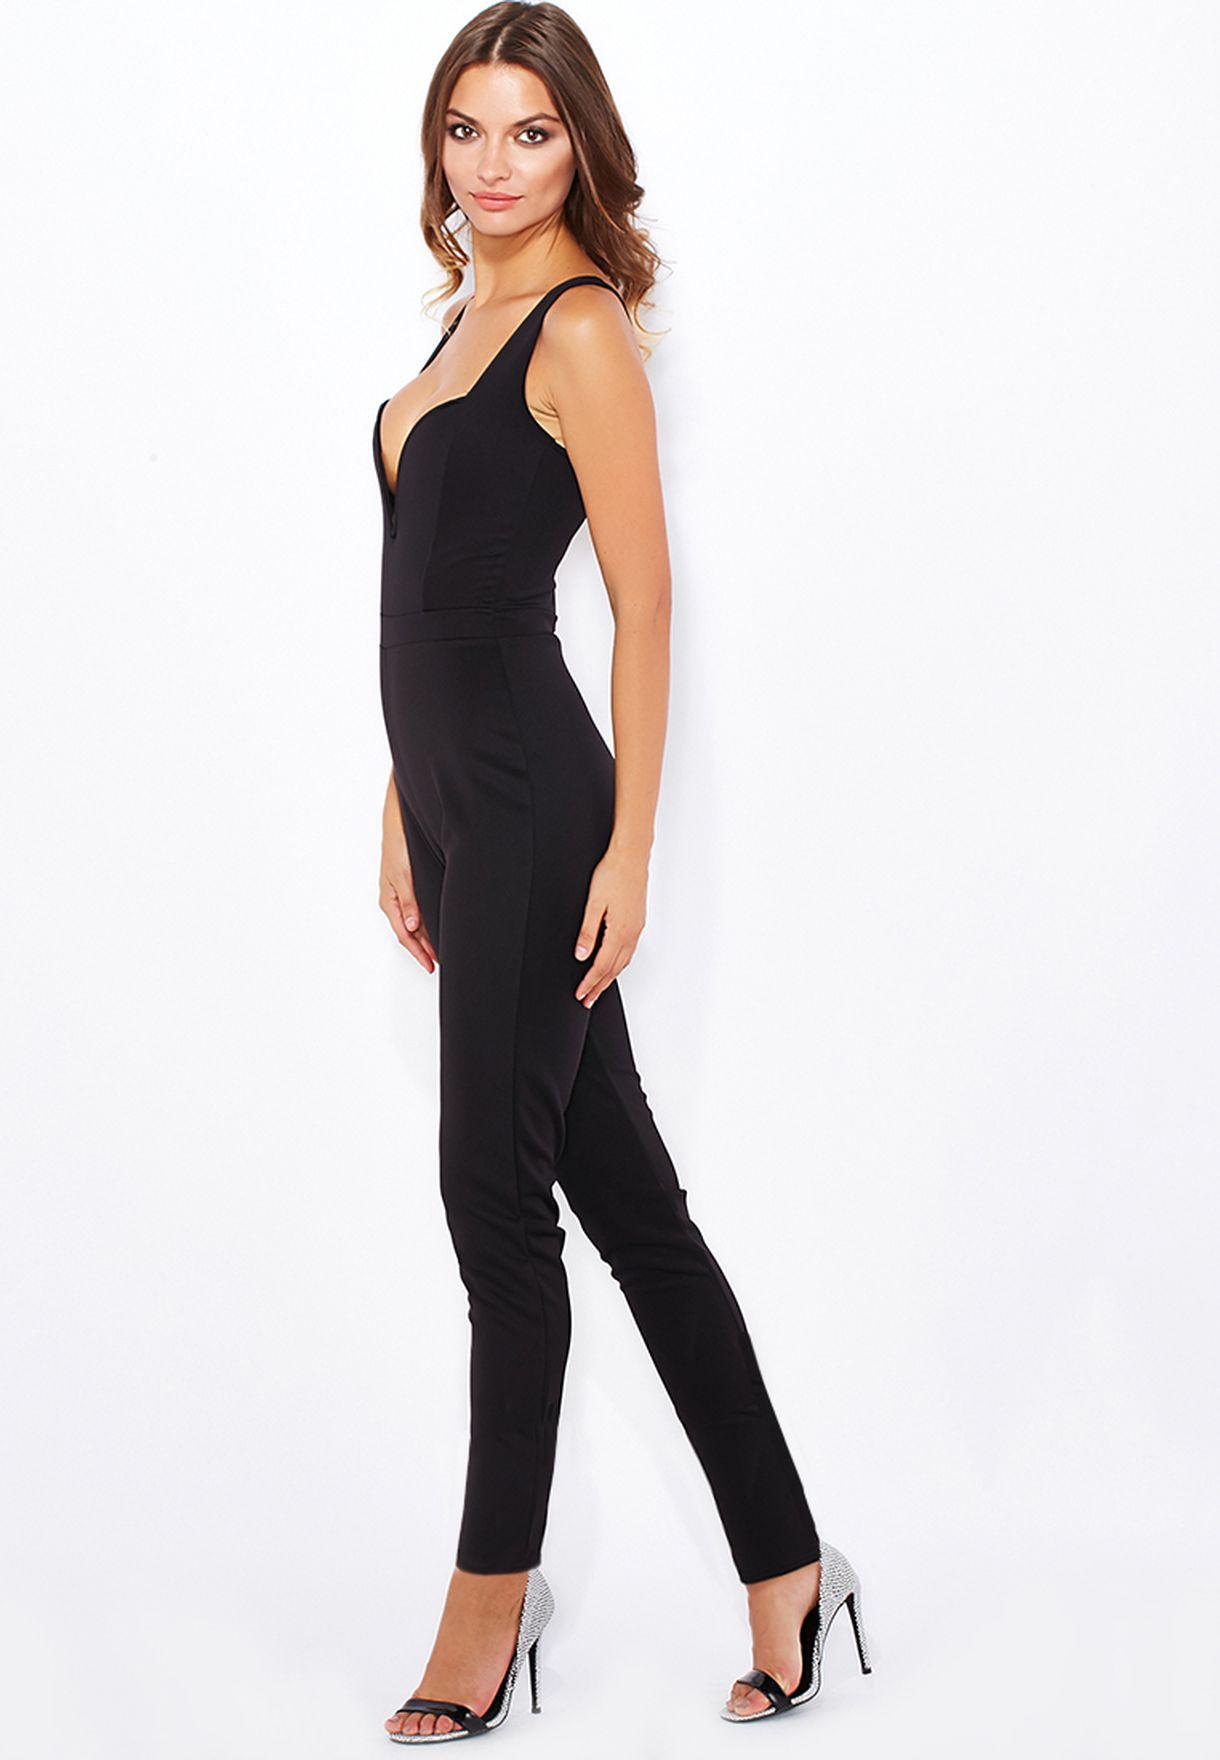 09fa079726e54 Shop Boohoo black Plunge Neck Jumpsuit AZZ22184 for Women in Bahrain ...